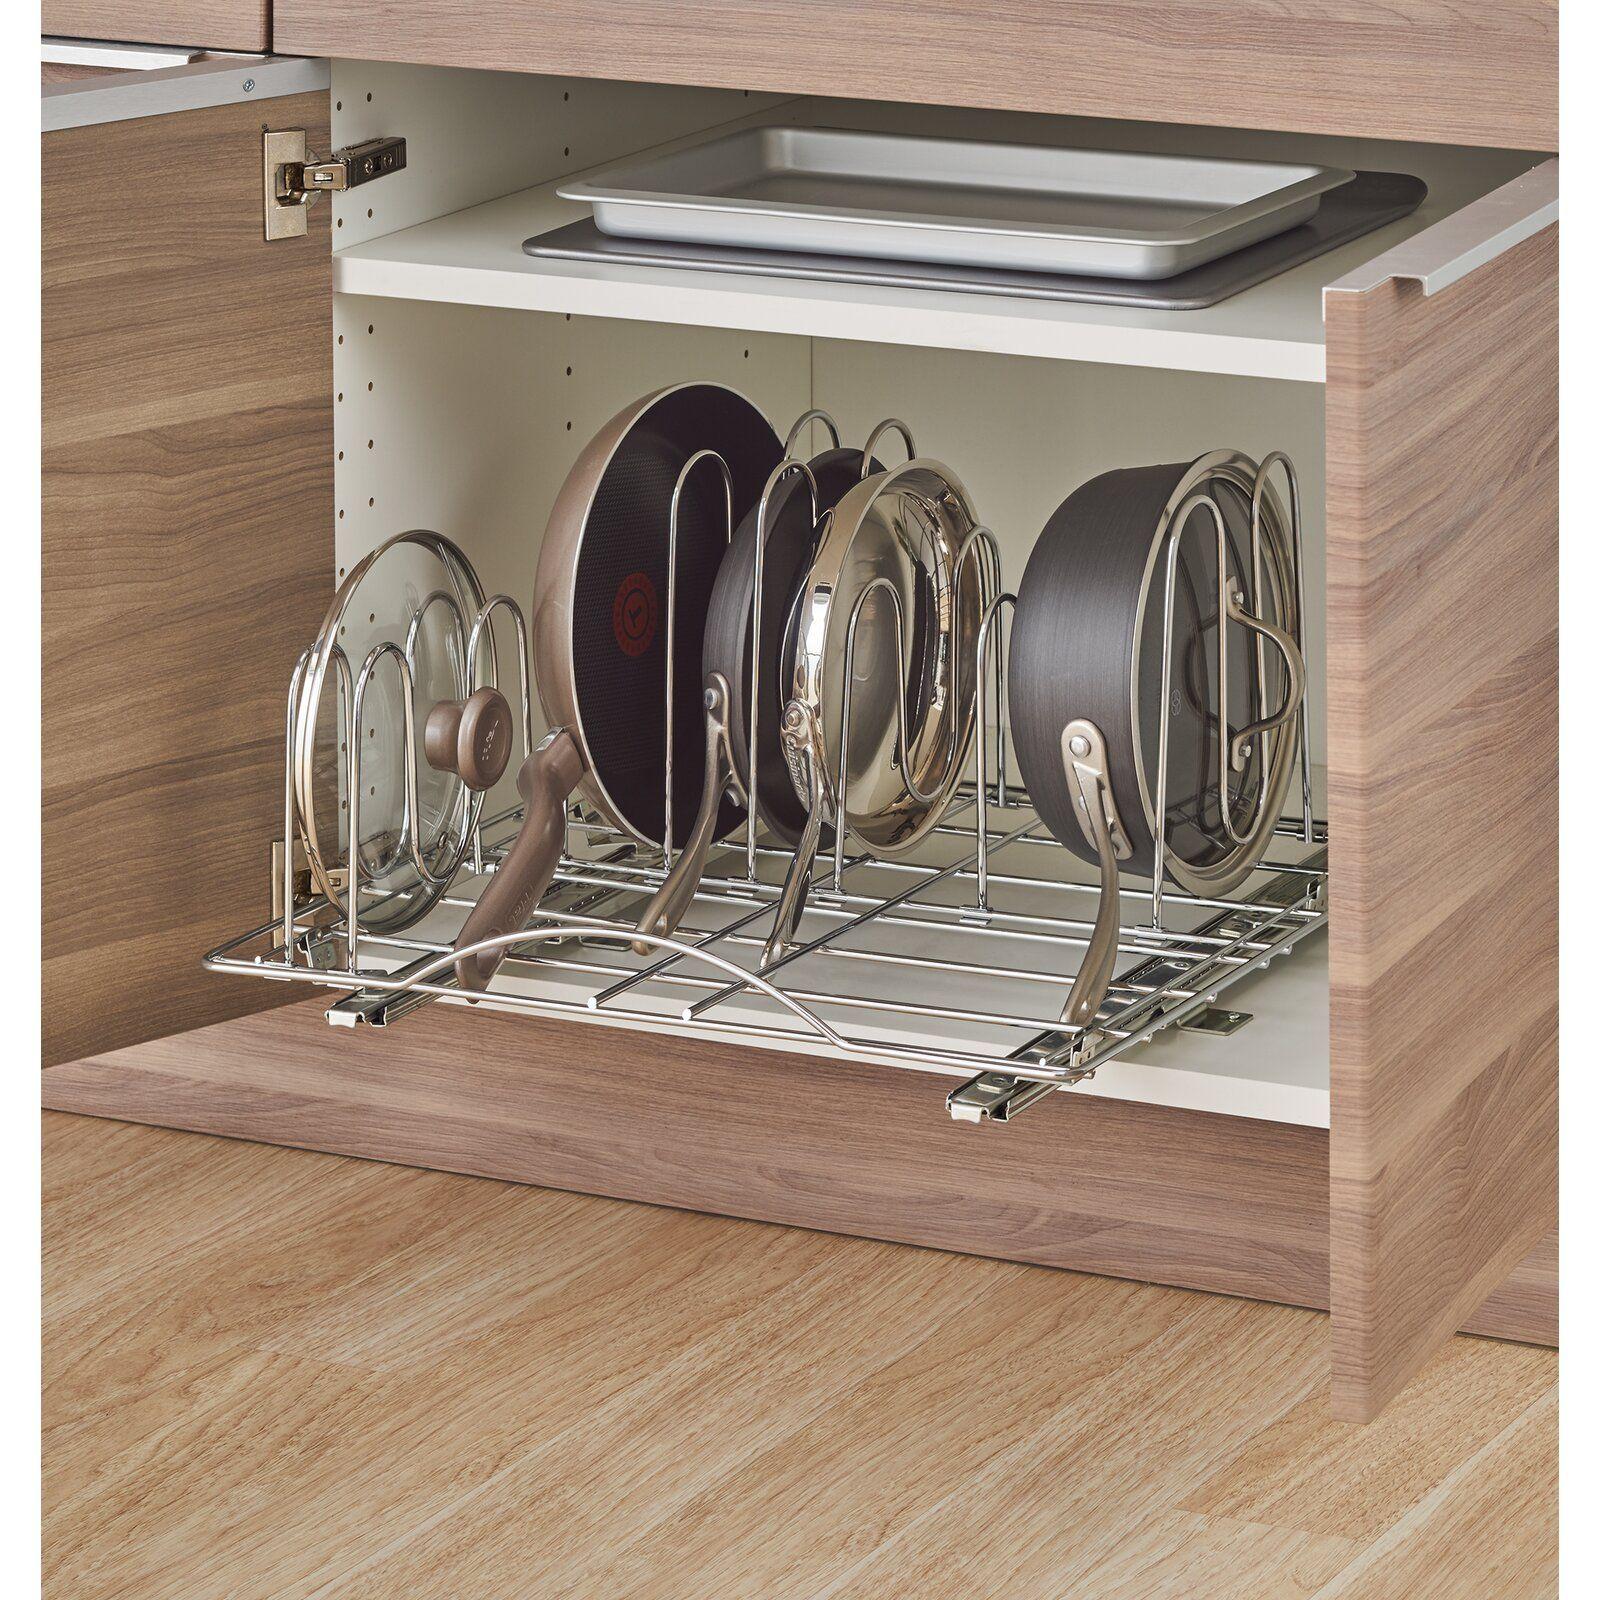 Trinity Sliding Pot Organizer Pull Out Kitchenware Divider Wayfair Pot Organization Kitchen Cabinet Organization Kitchen Pot